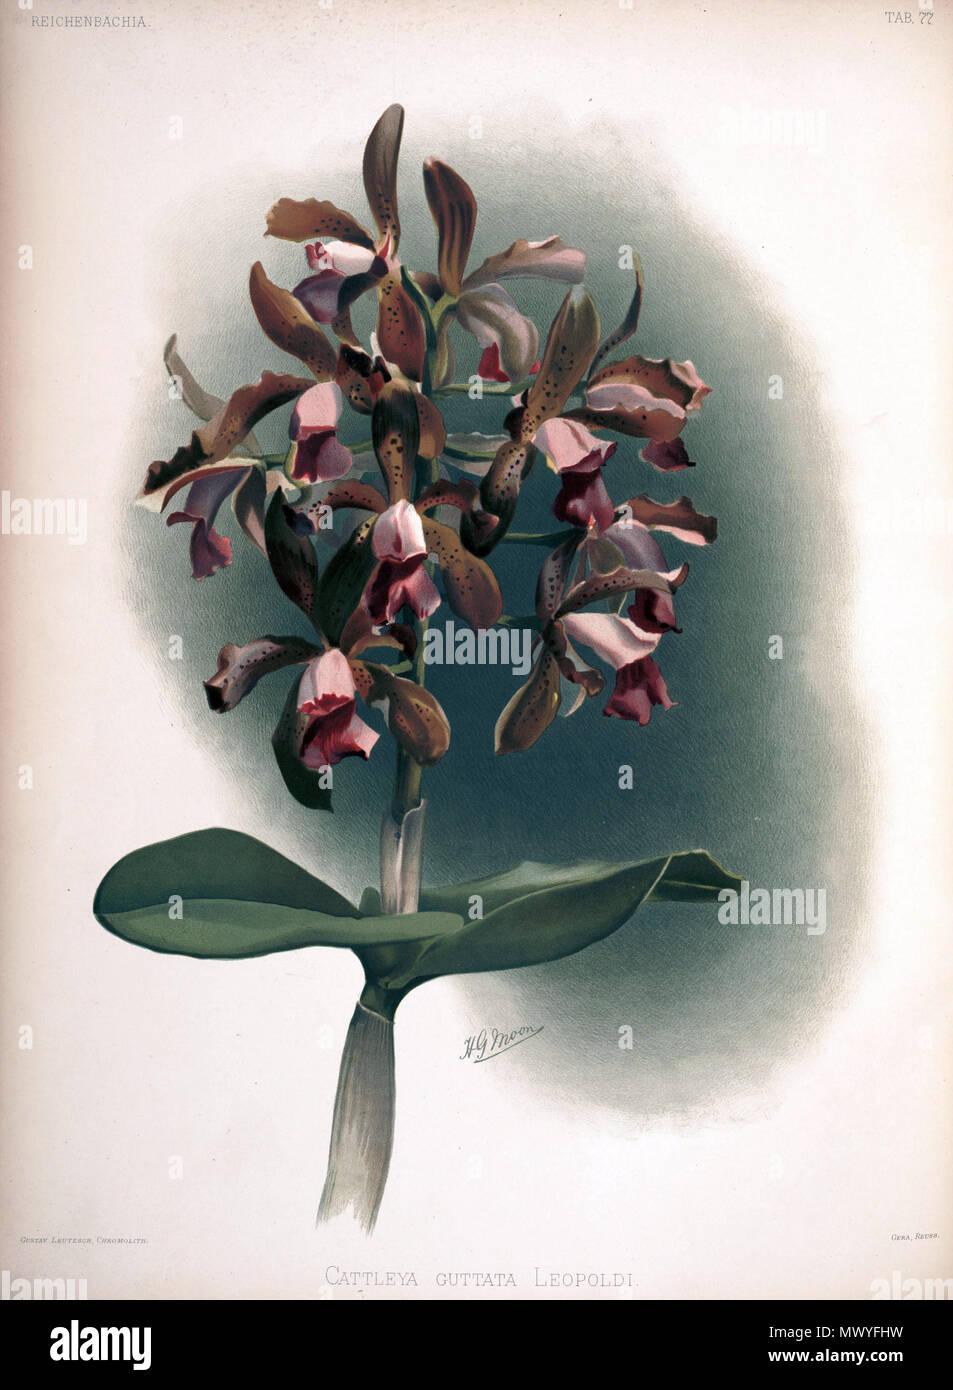 . Cattleya tigrina as syn.: Cattleya guttata var. leopoldii . between 1888 and 1894. H. Sotheran & Co., London (editor) 221 Frederick Sander - Reichenbachia II plate 77 (1890) - Cattleya guttata leopoldi - Stock Image